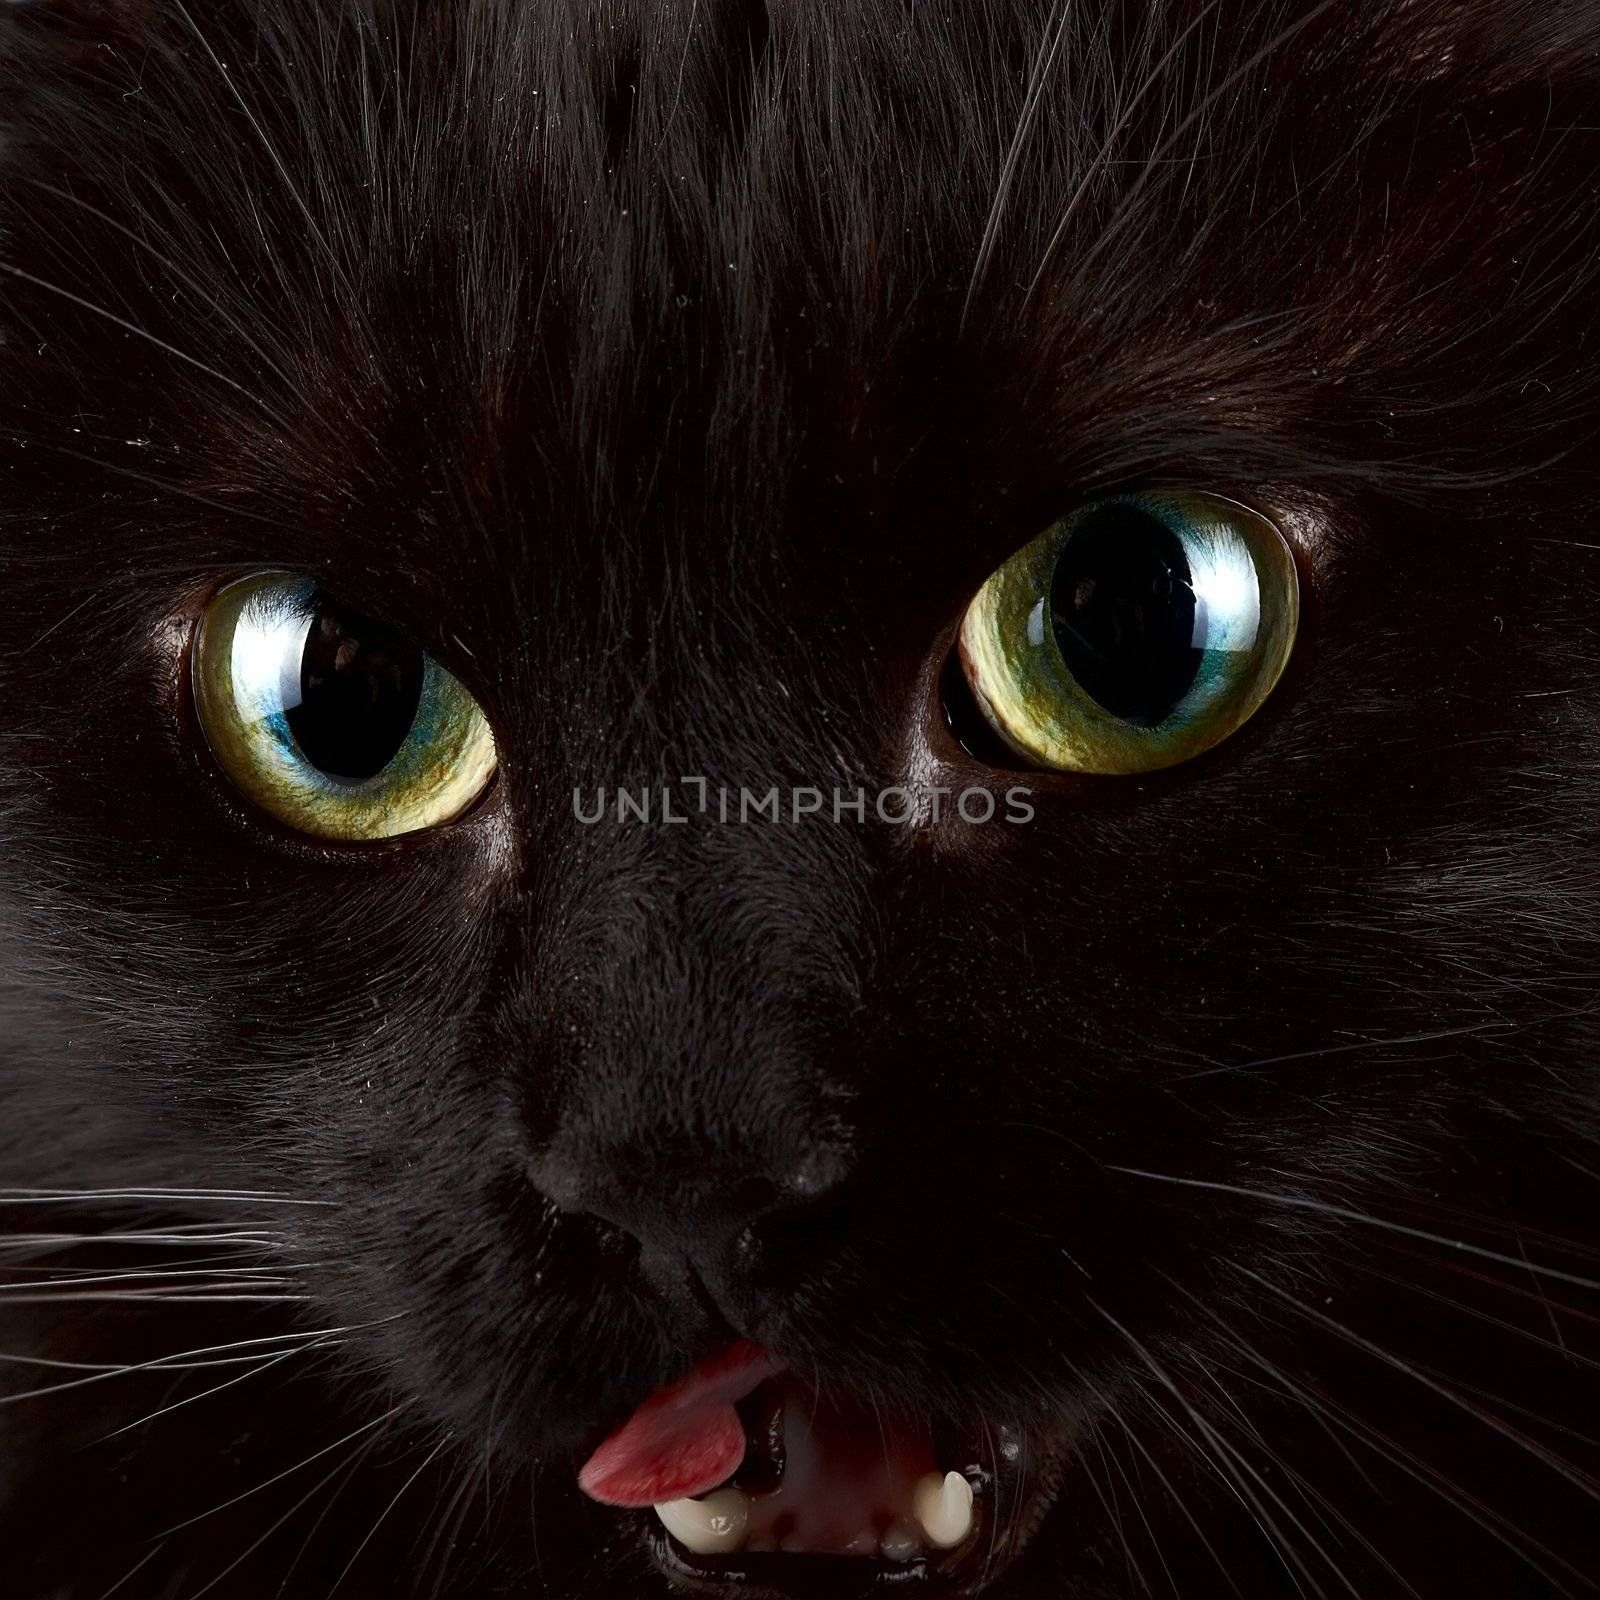 Green eyes of a black cat